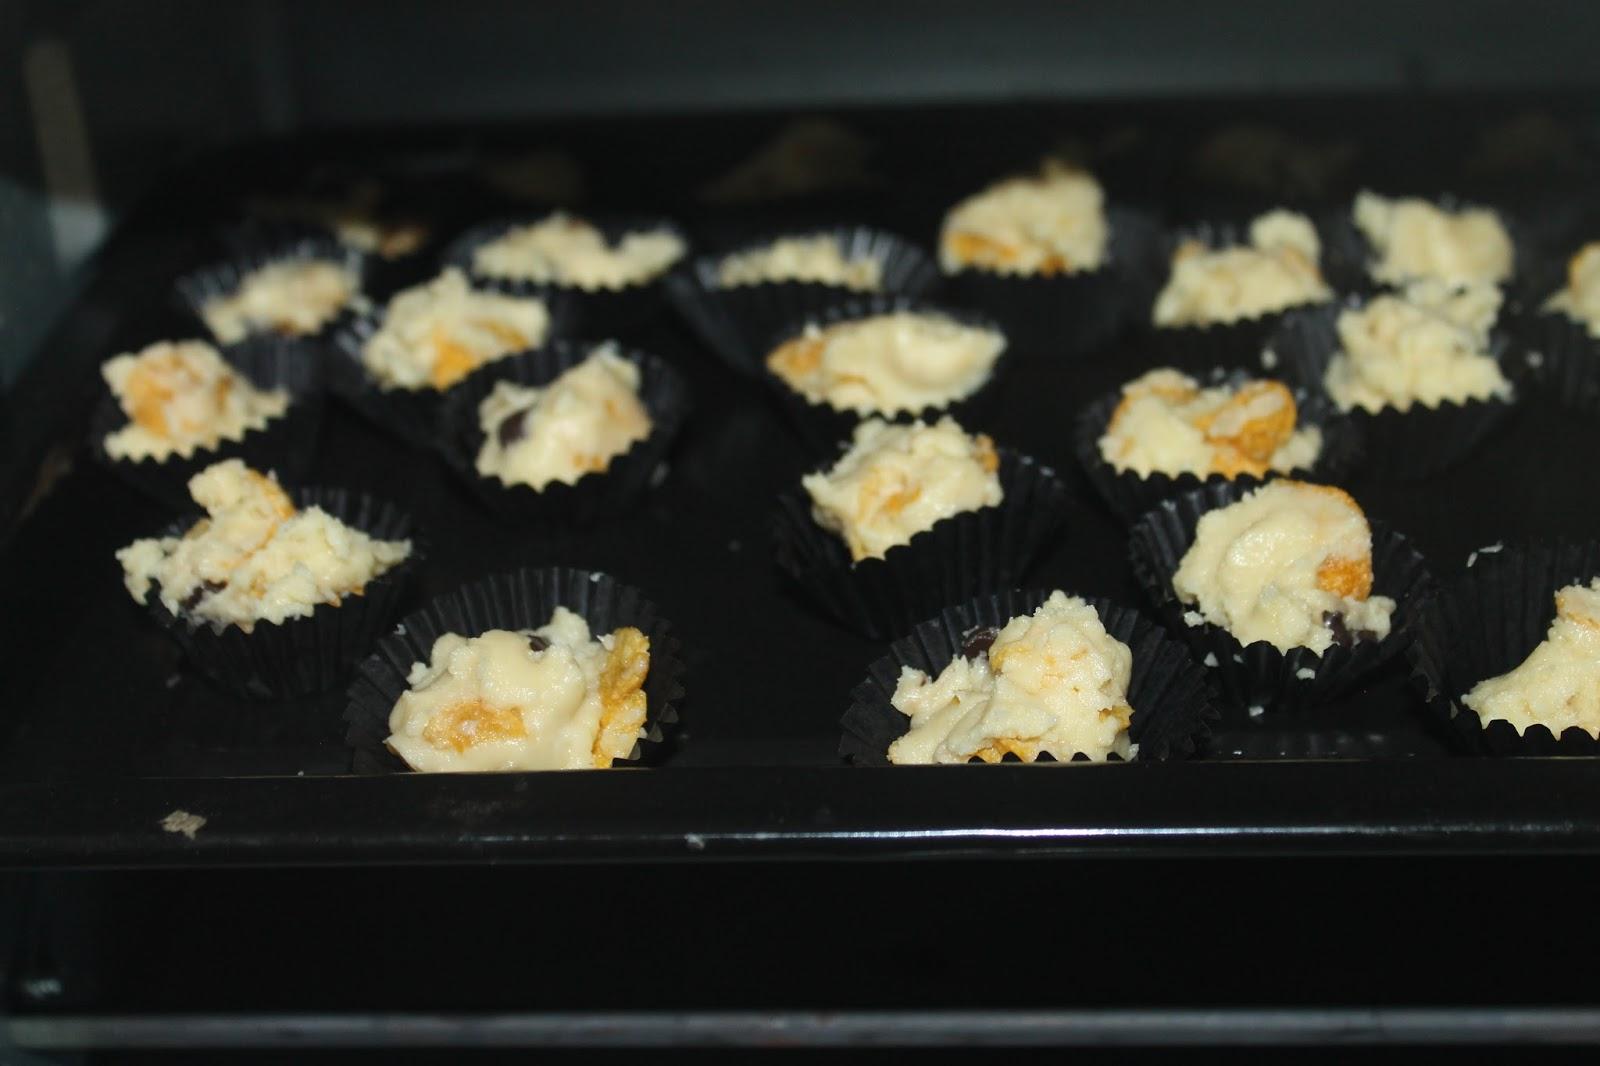 Resepi Biskut dan Kerepek Kellogg's Corn Flakes® versi AyuArjuna, Meh Cuba!